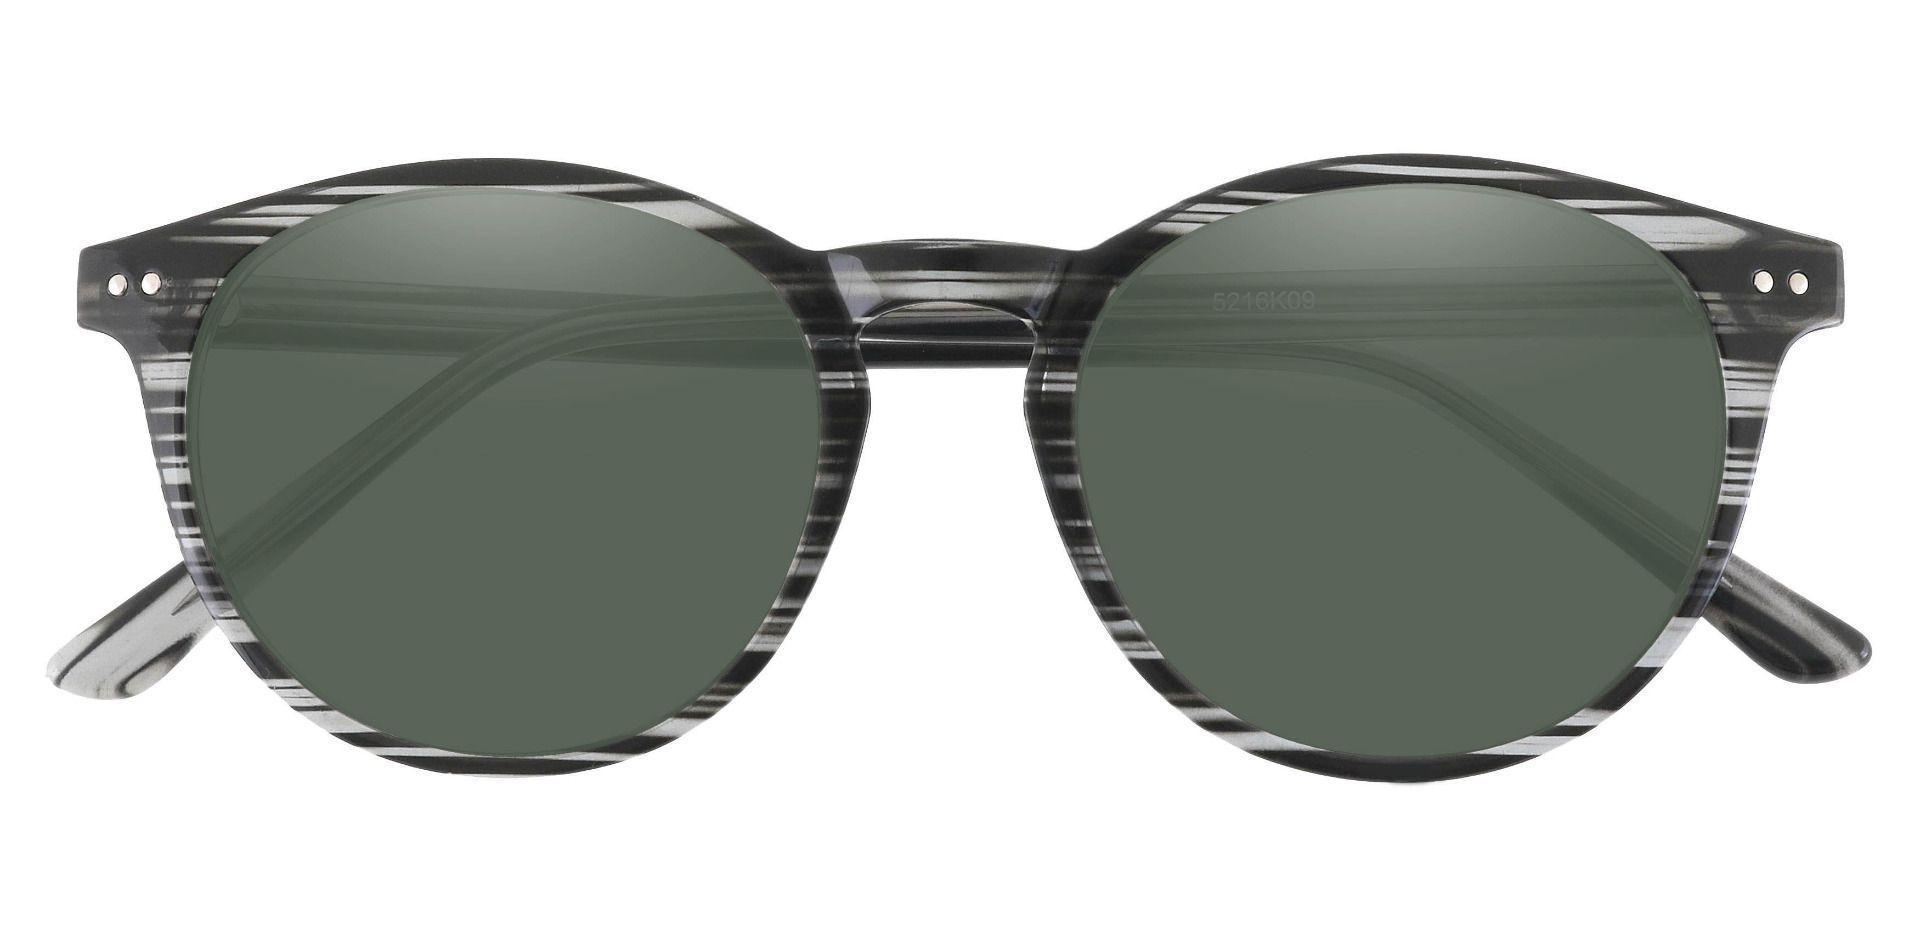 Dormont Round Prescription Sunglasses - Black Frame With Green Lenses